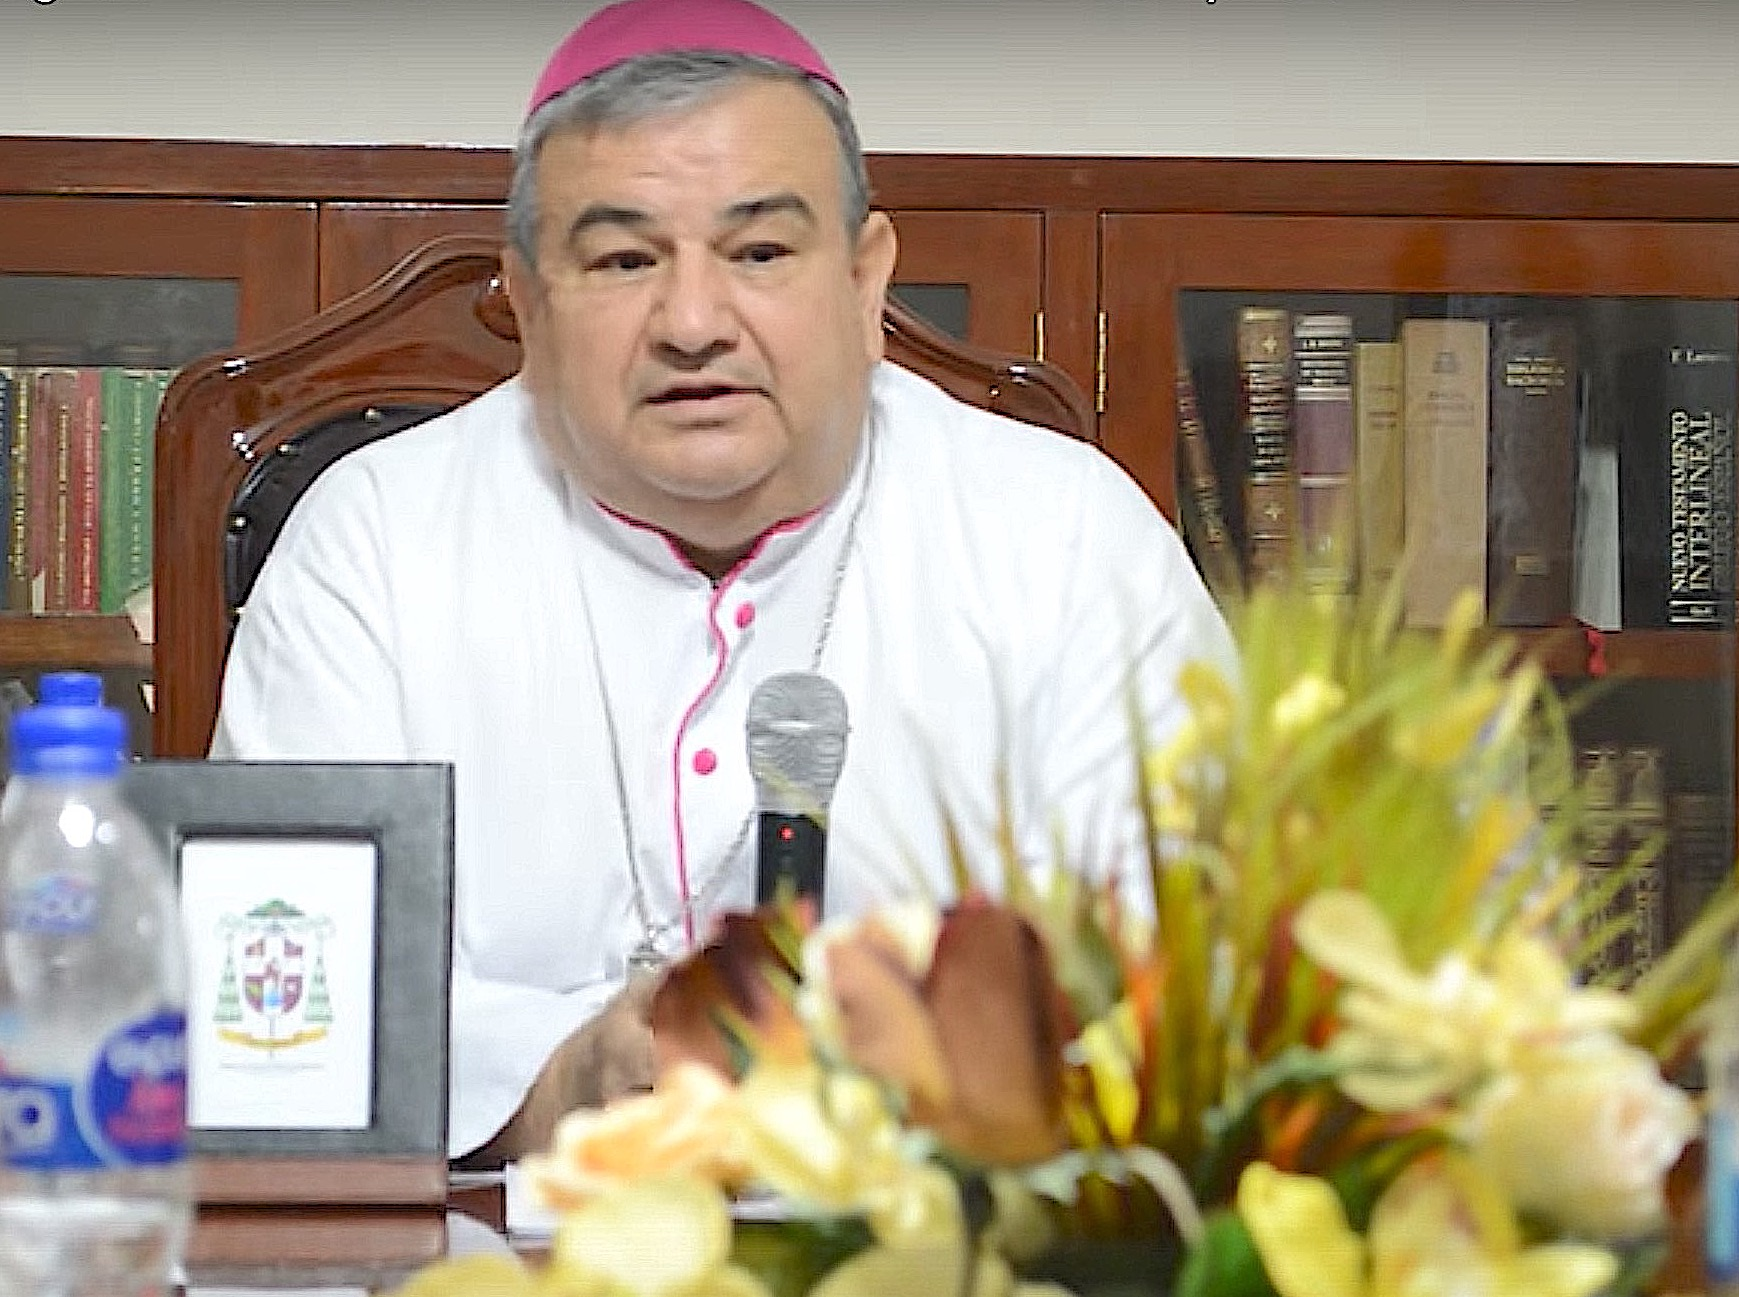 Mons. Carlos Garfias Merlos